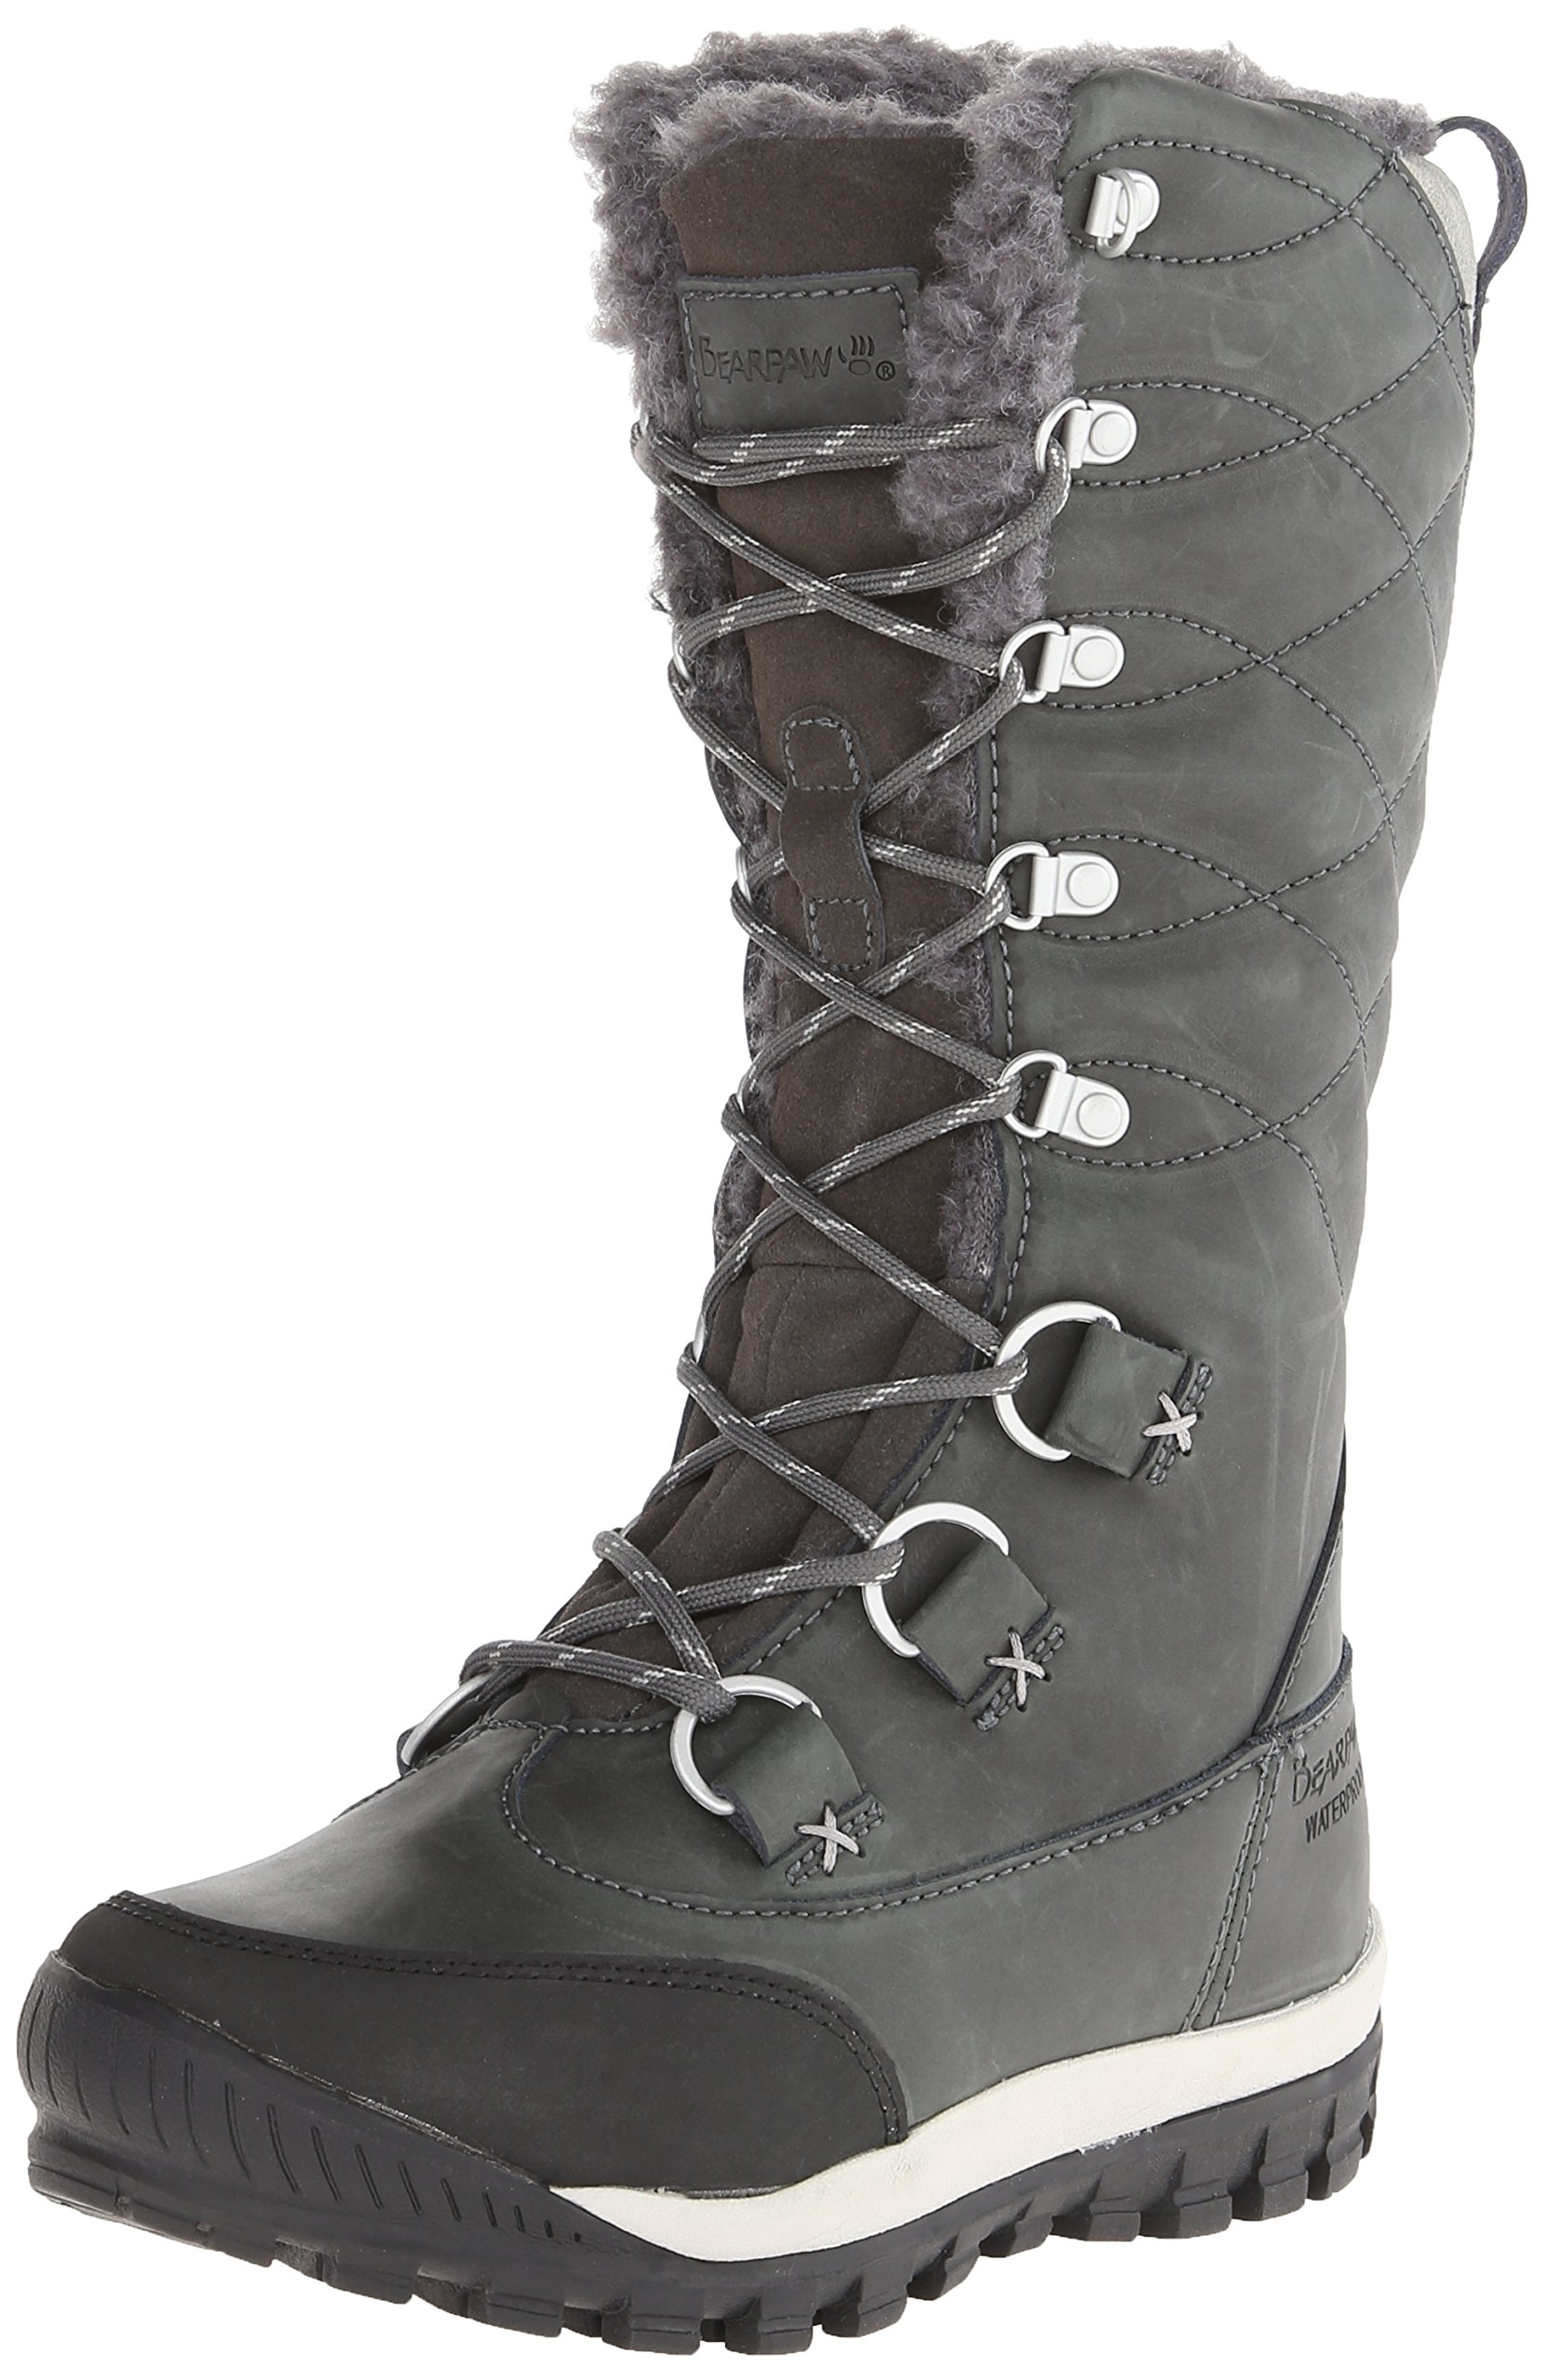 BEARPAW Women's Isabella Winter Boot, Charcoal, 6 M US